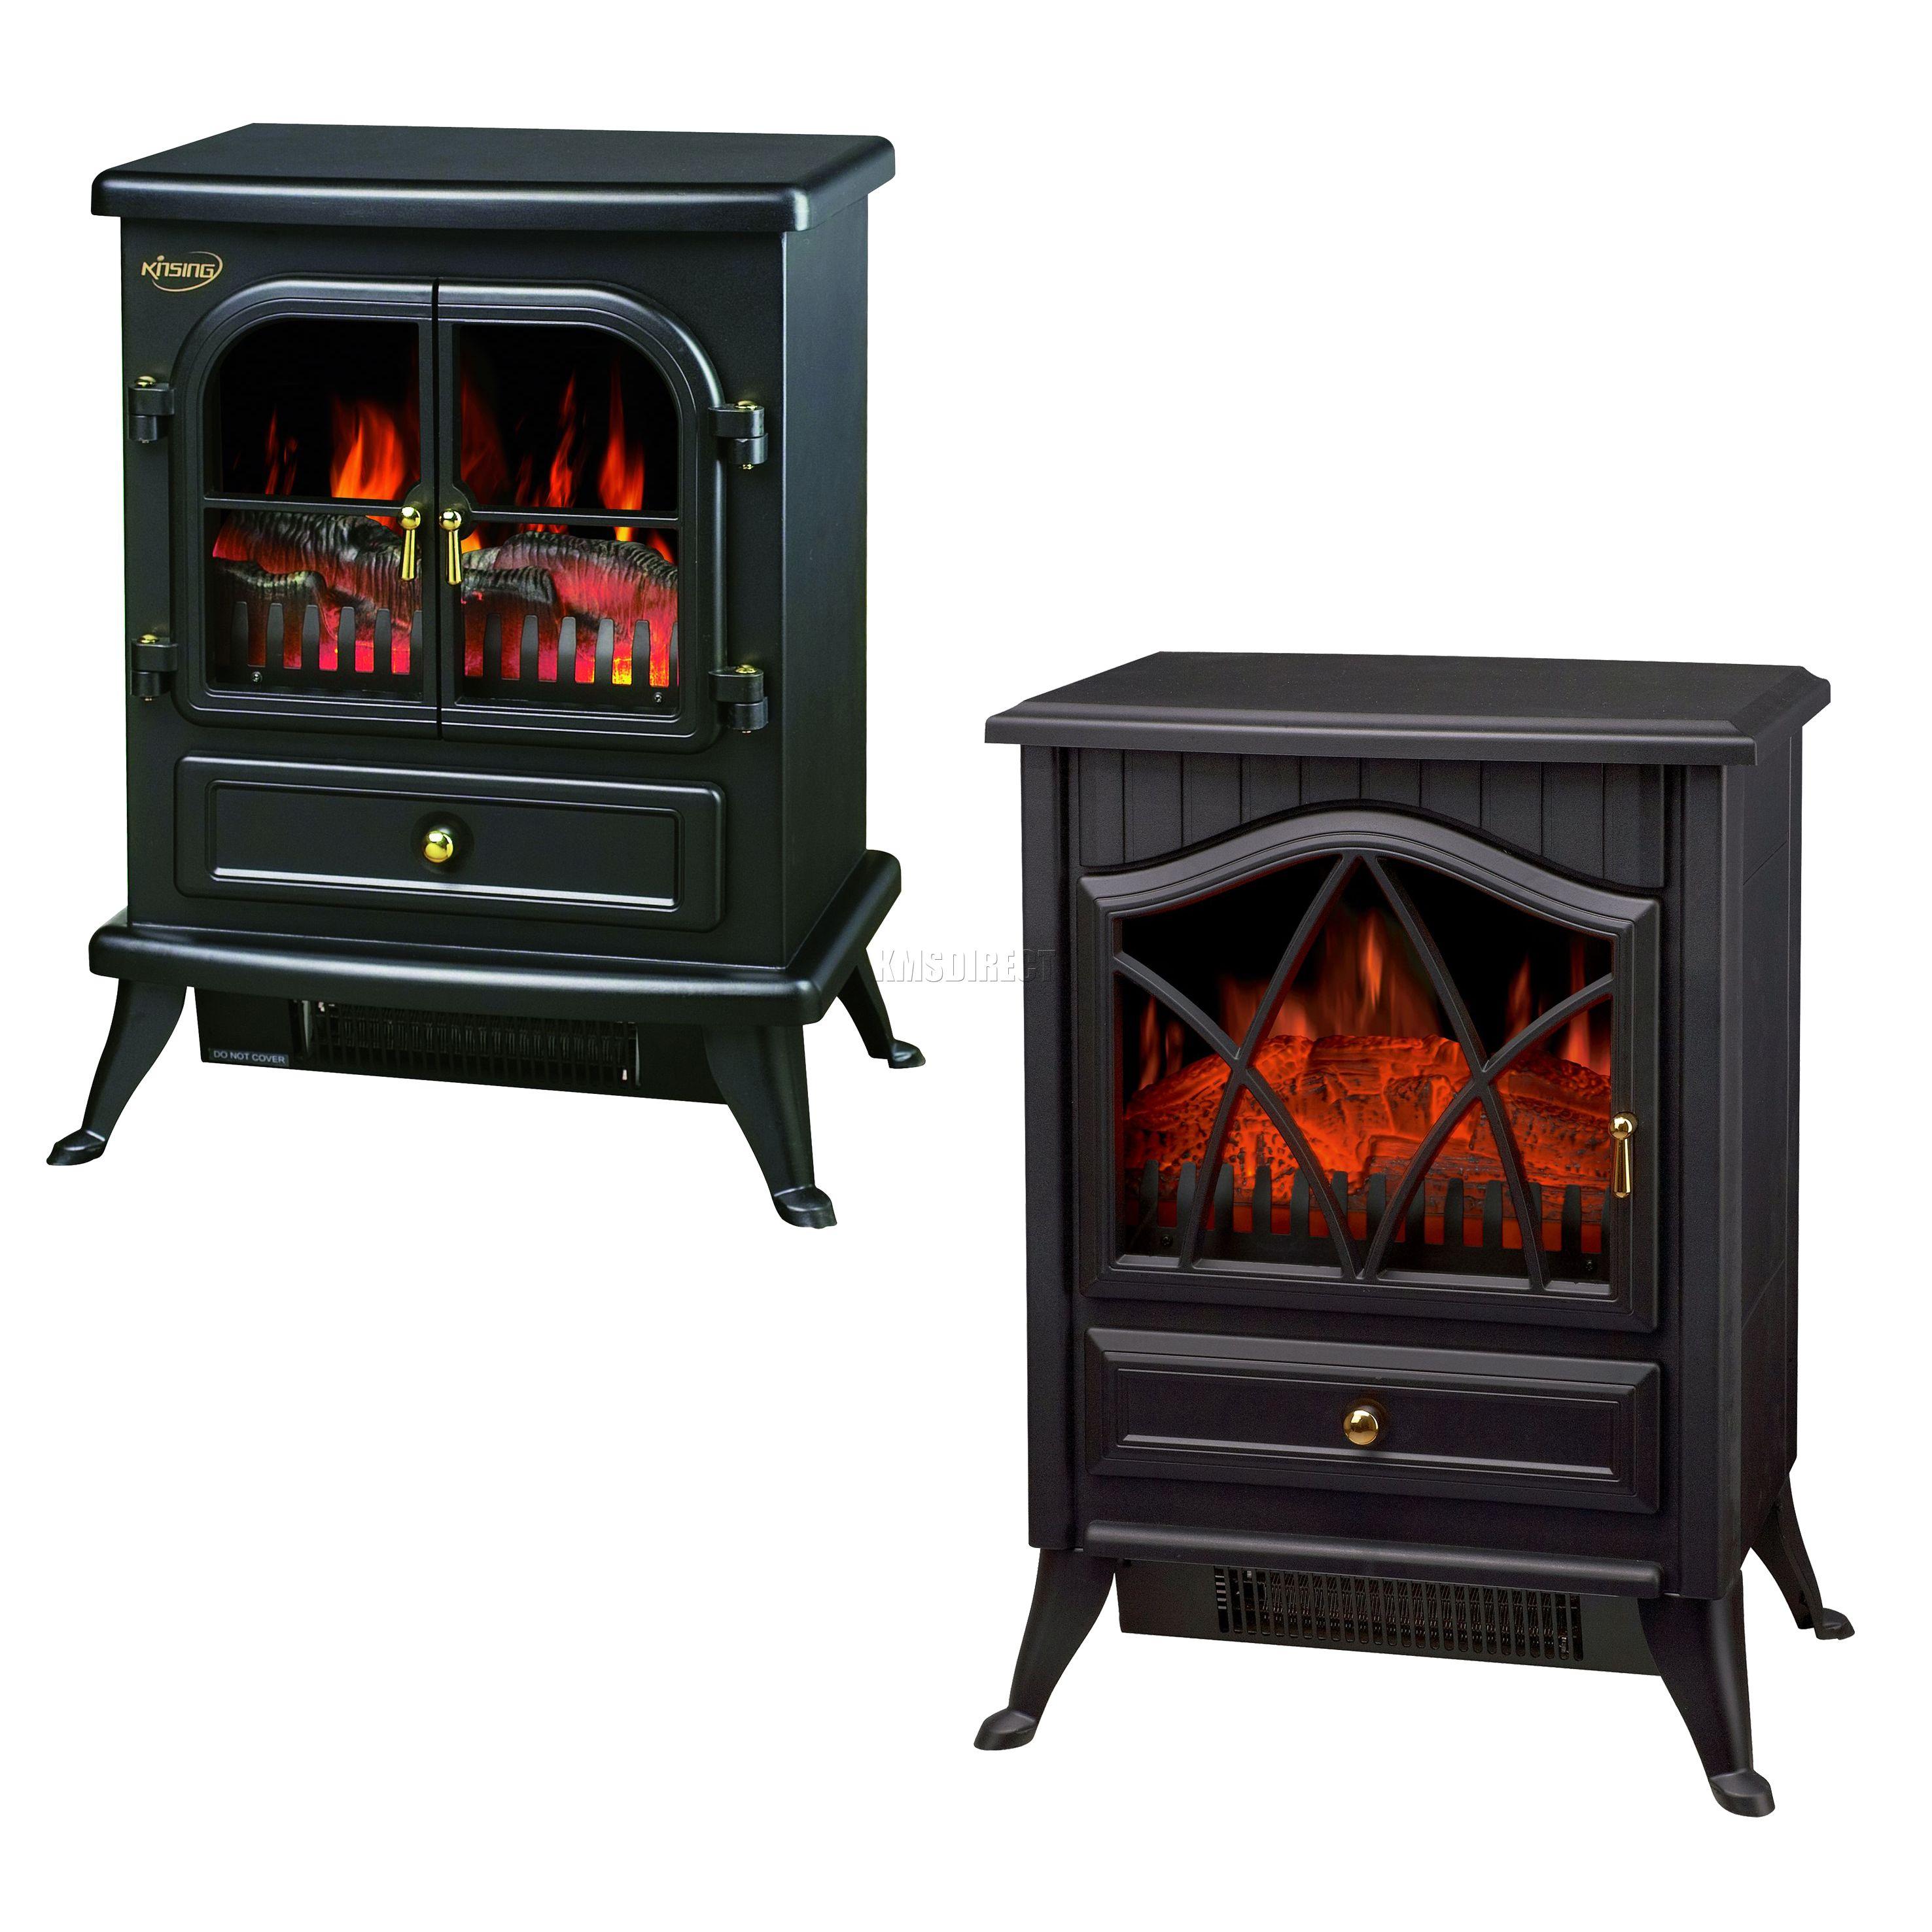 new 1850w log burning flame effect stove electric fire. Black Bedroom Furniture Sets. Home Design Ideas